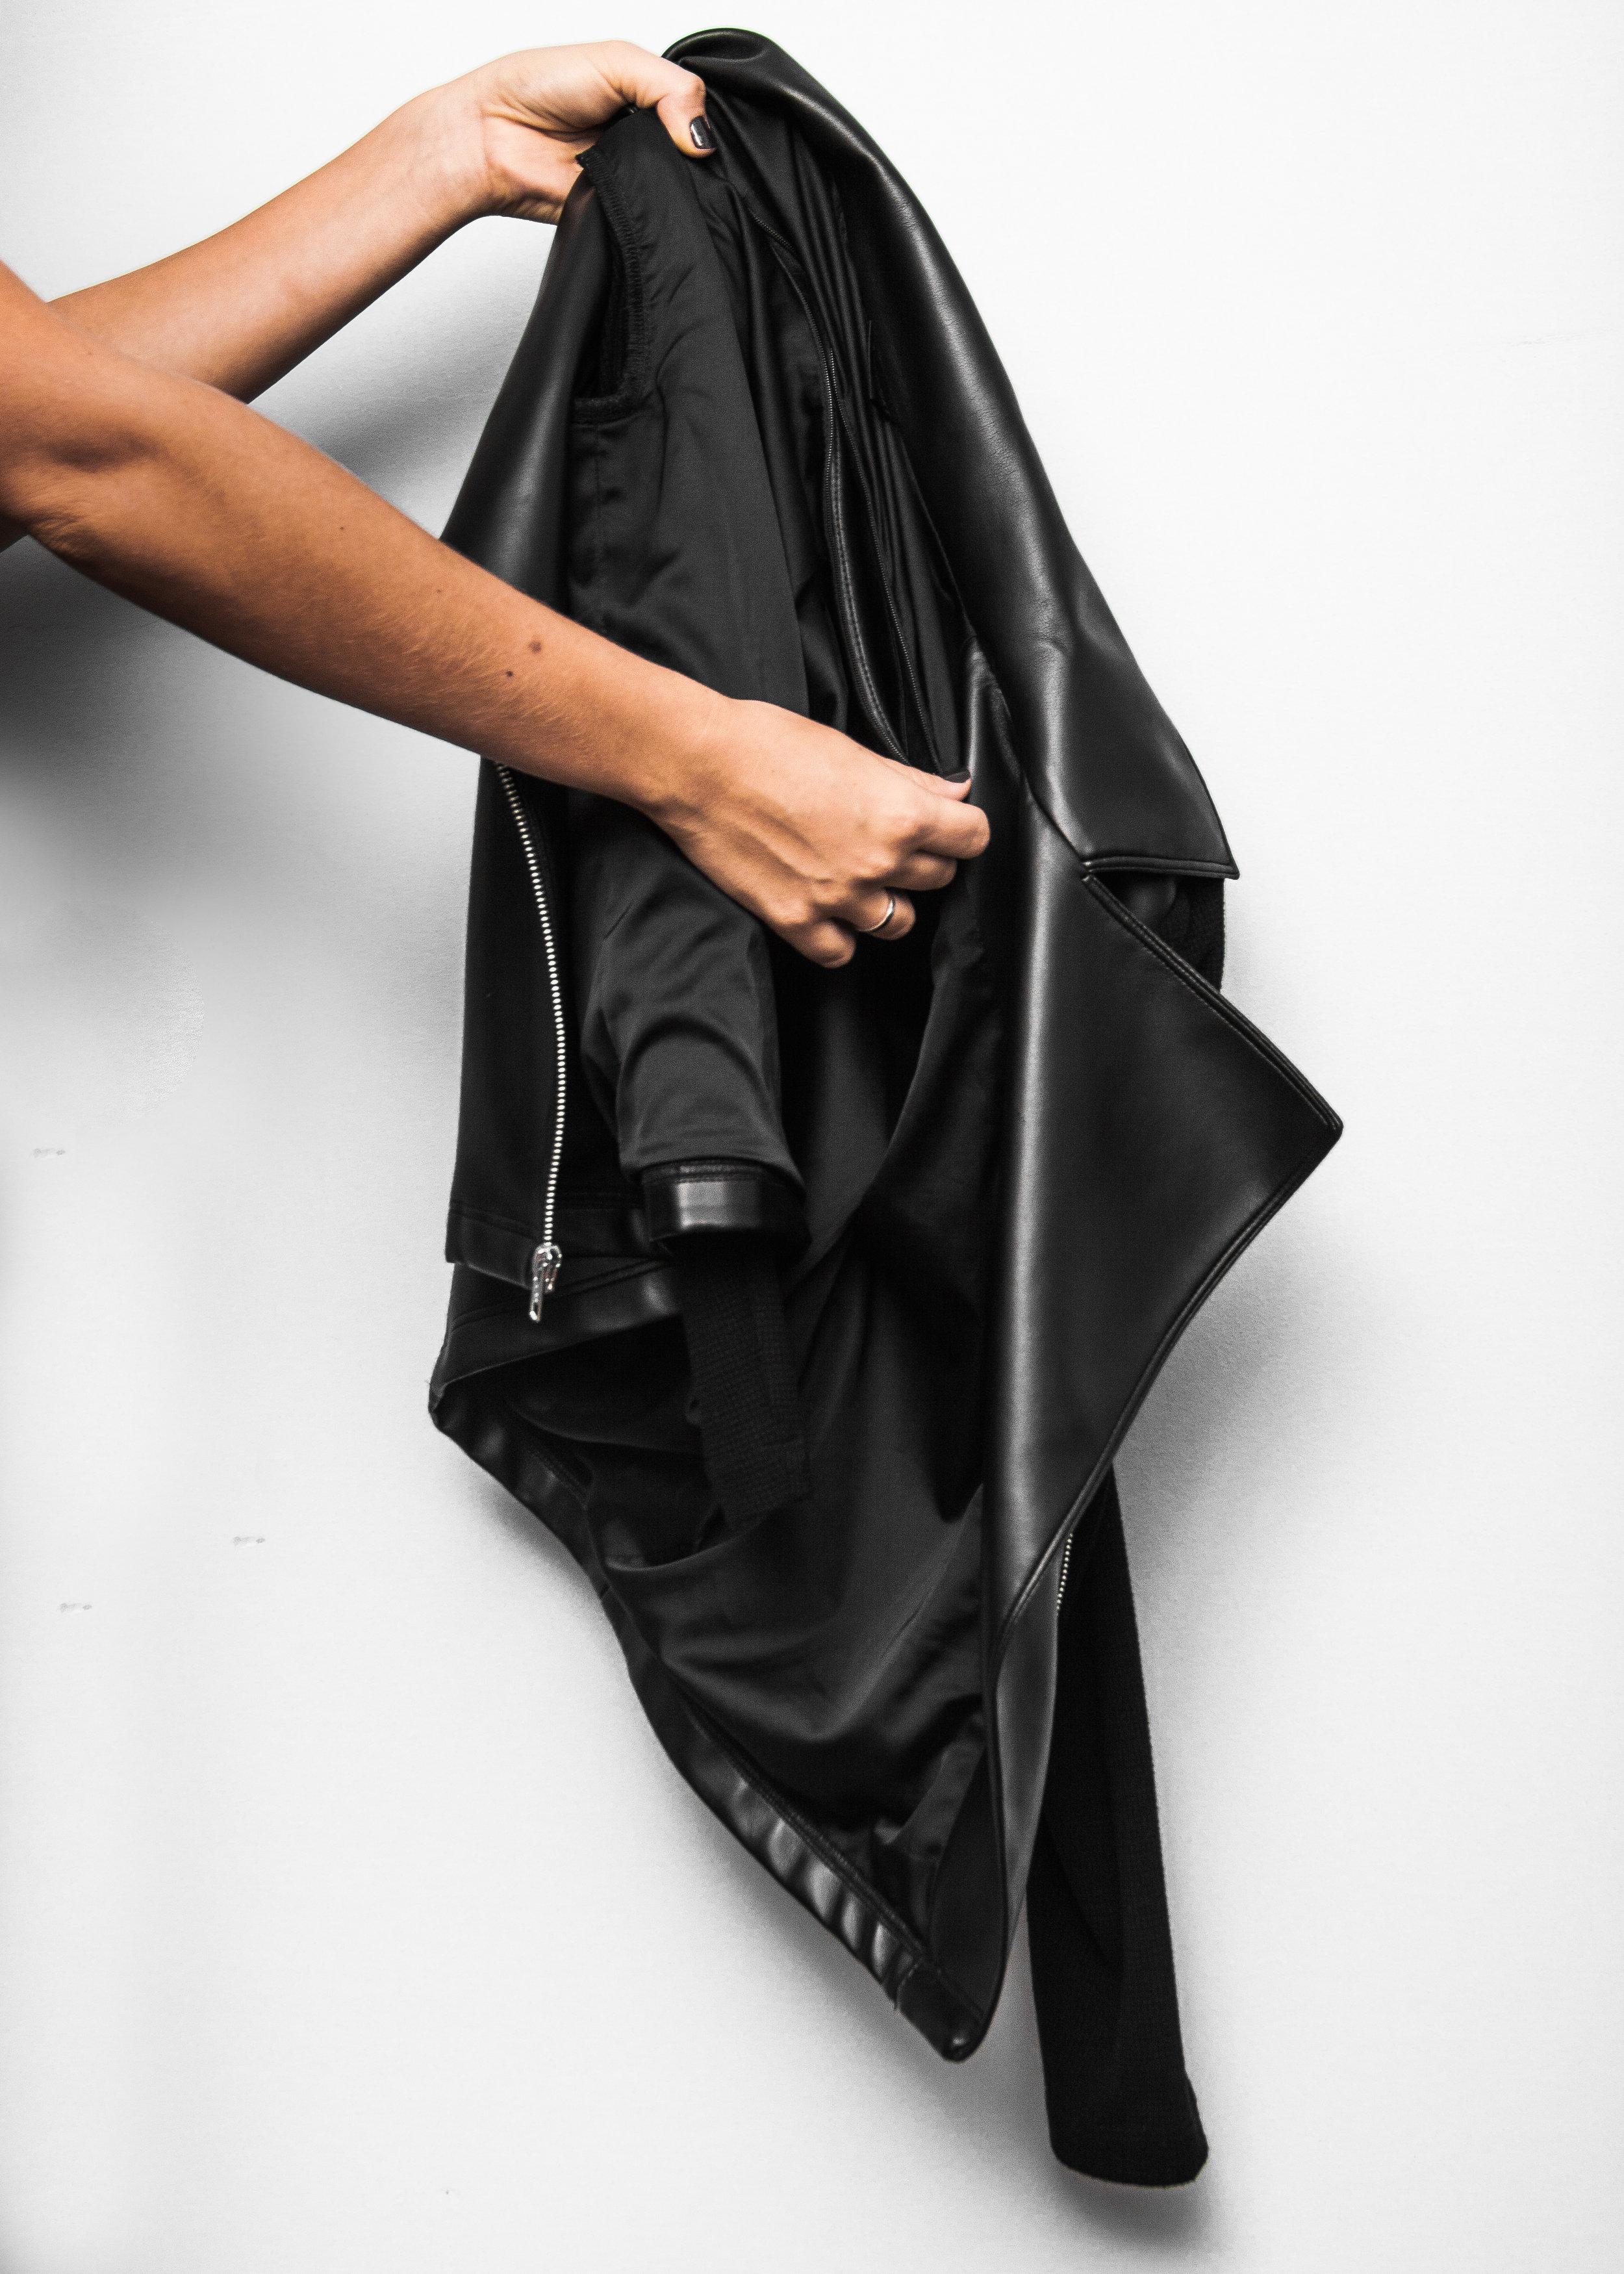 2. Unzip inner lining